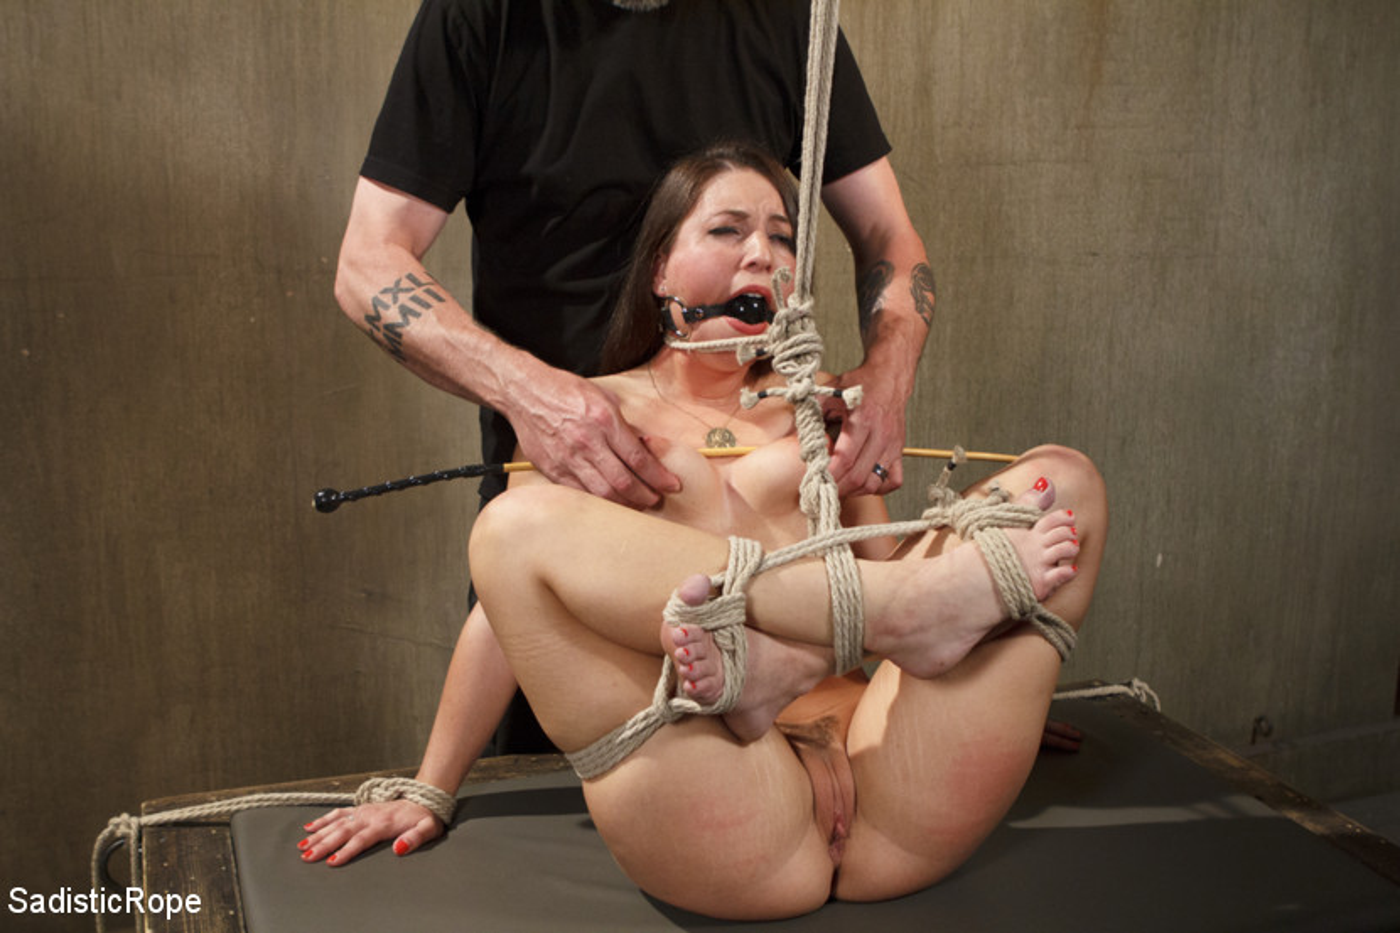 sexvideos anal hook